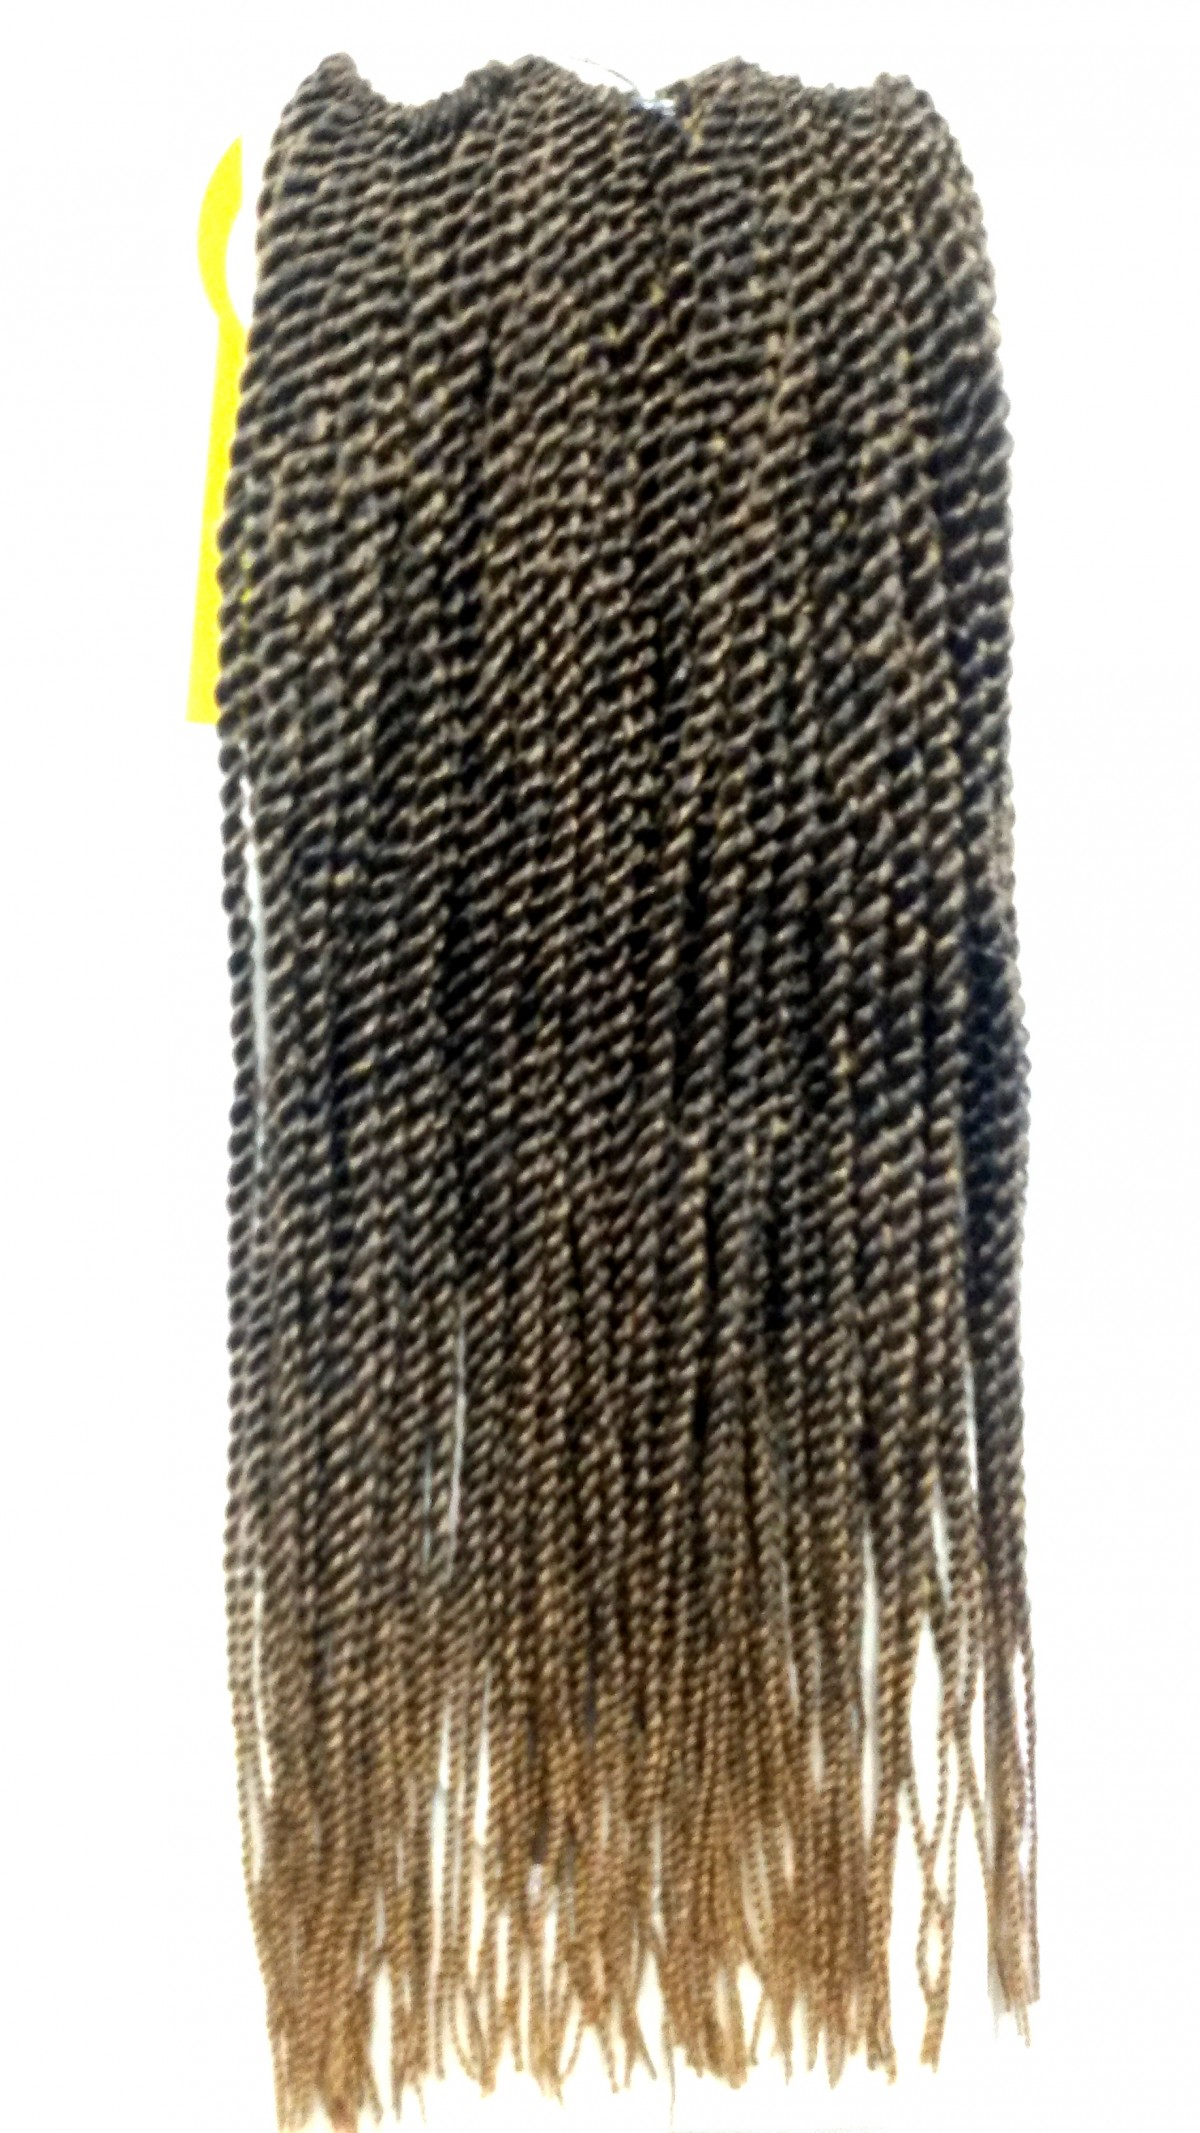 Foto 1 - Mini Senegales Twist Afro Braids + Agulha- Ser Mulher 270g